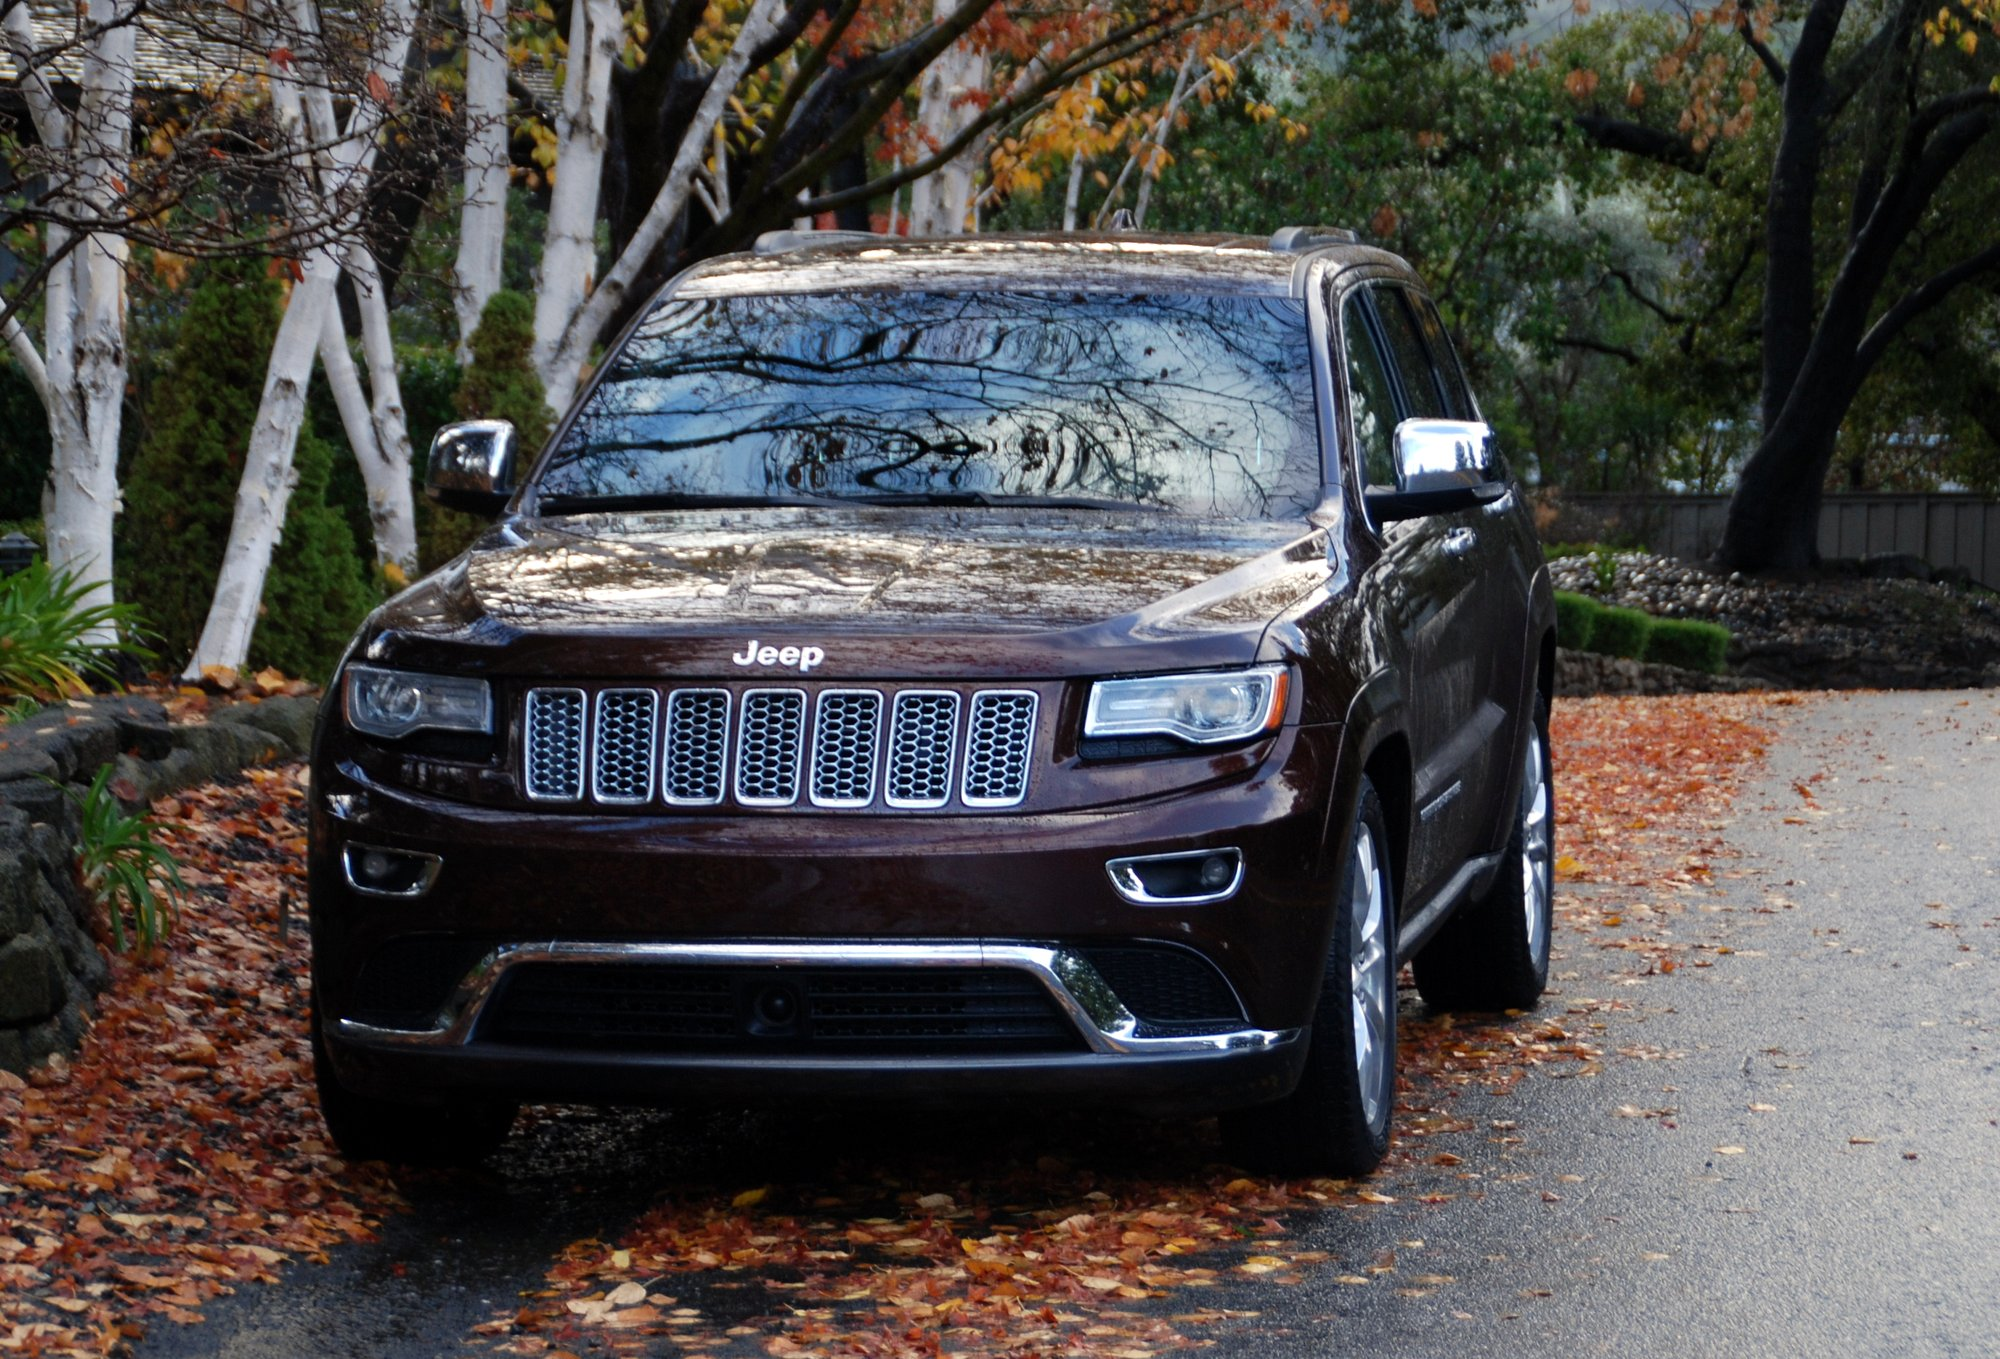 2014 Jeep Grand Cherokee, EcoDiesel,mpg, Fuel Economy